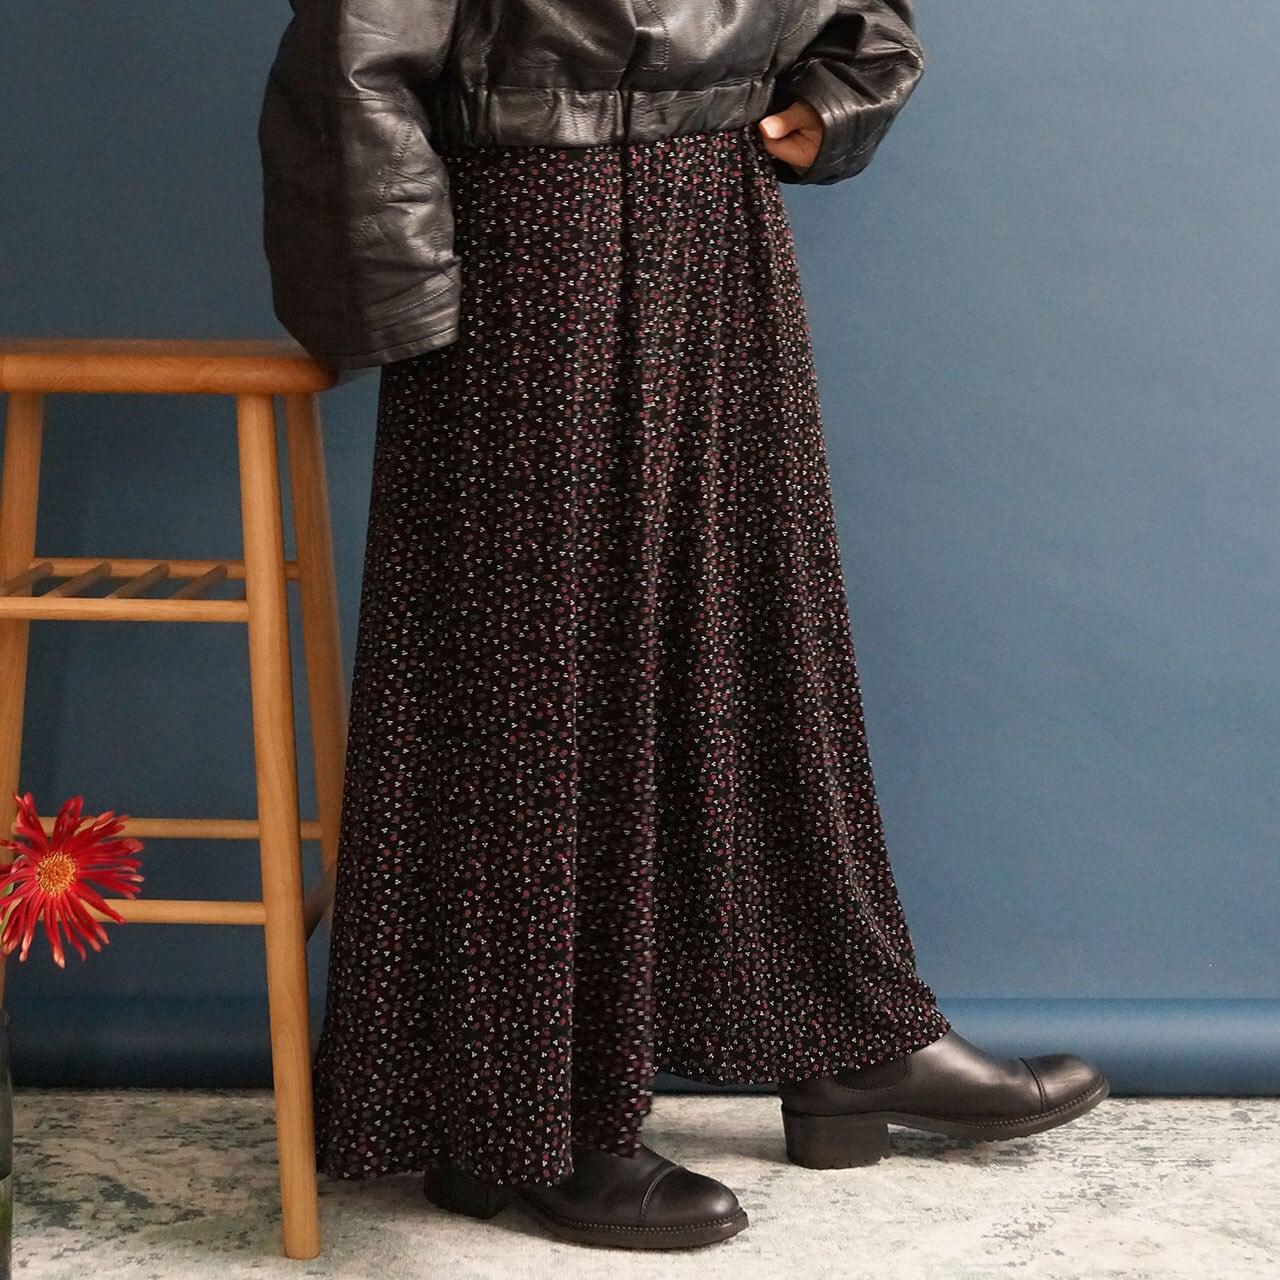 【送料無料】80's Vintage Black Flower Print Maxi Skirt